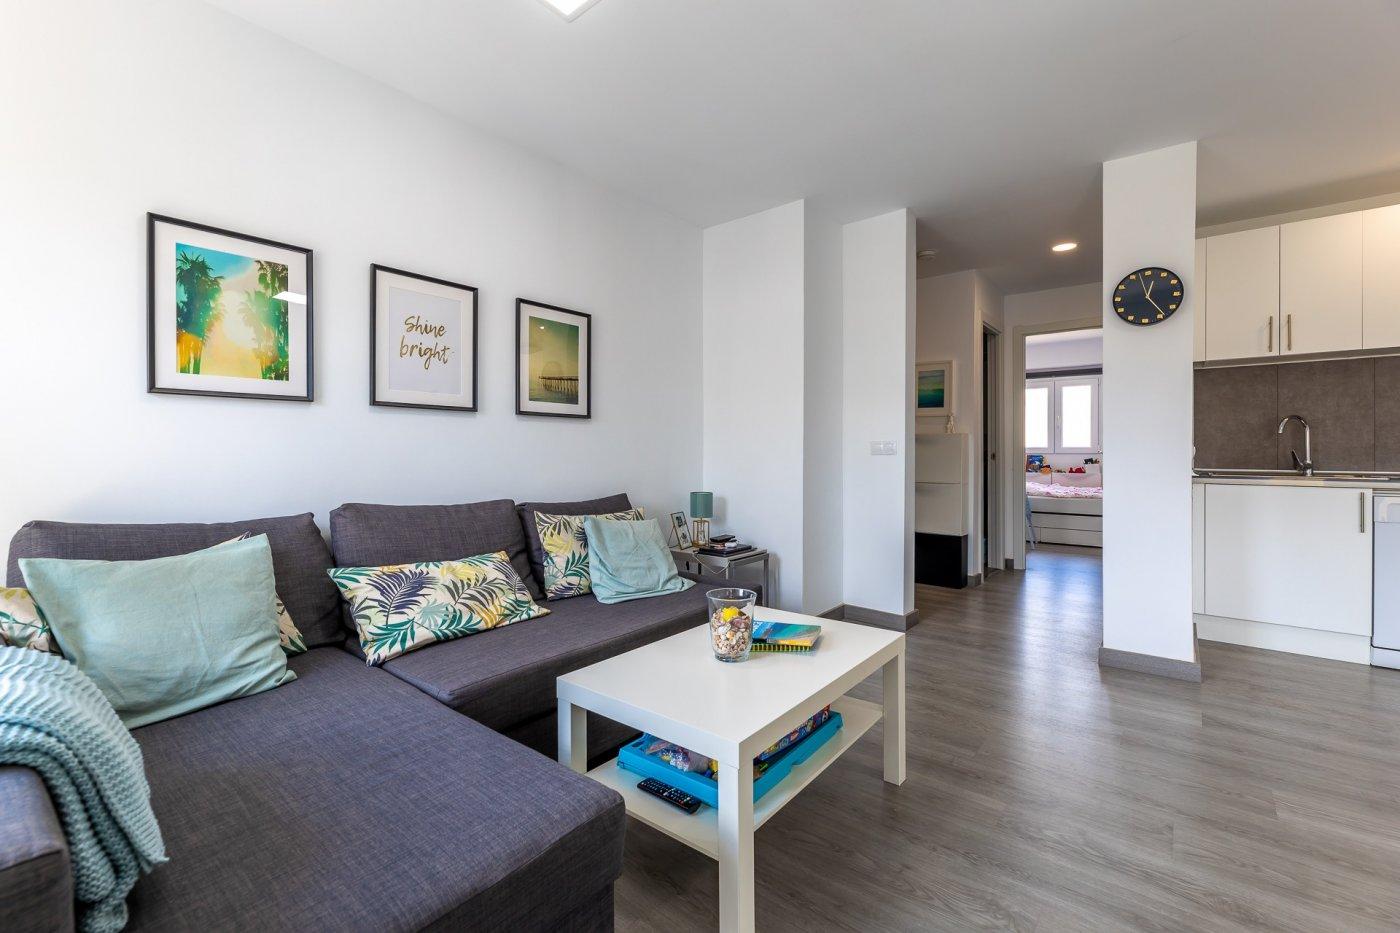 Acogedor piso en zona foners, palma - imagenInmueble5